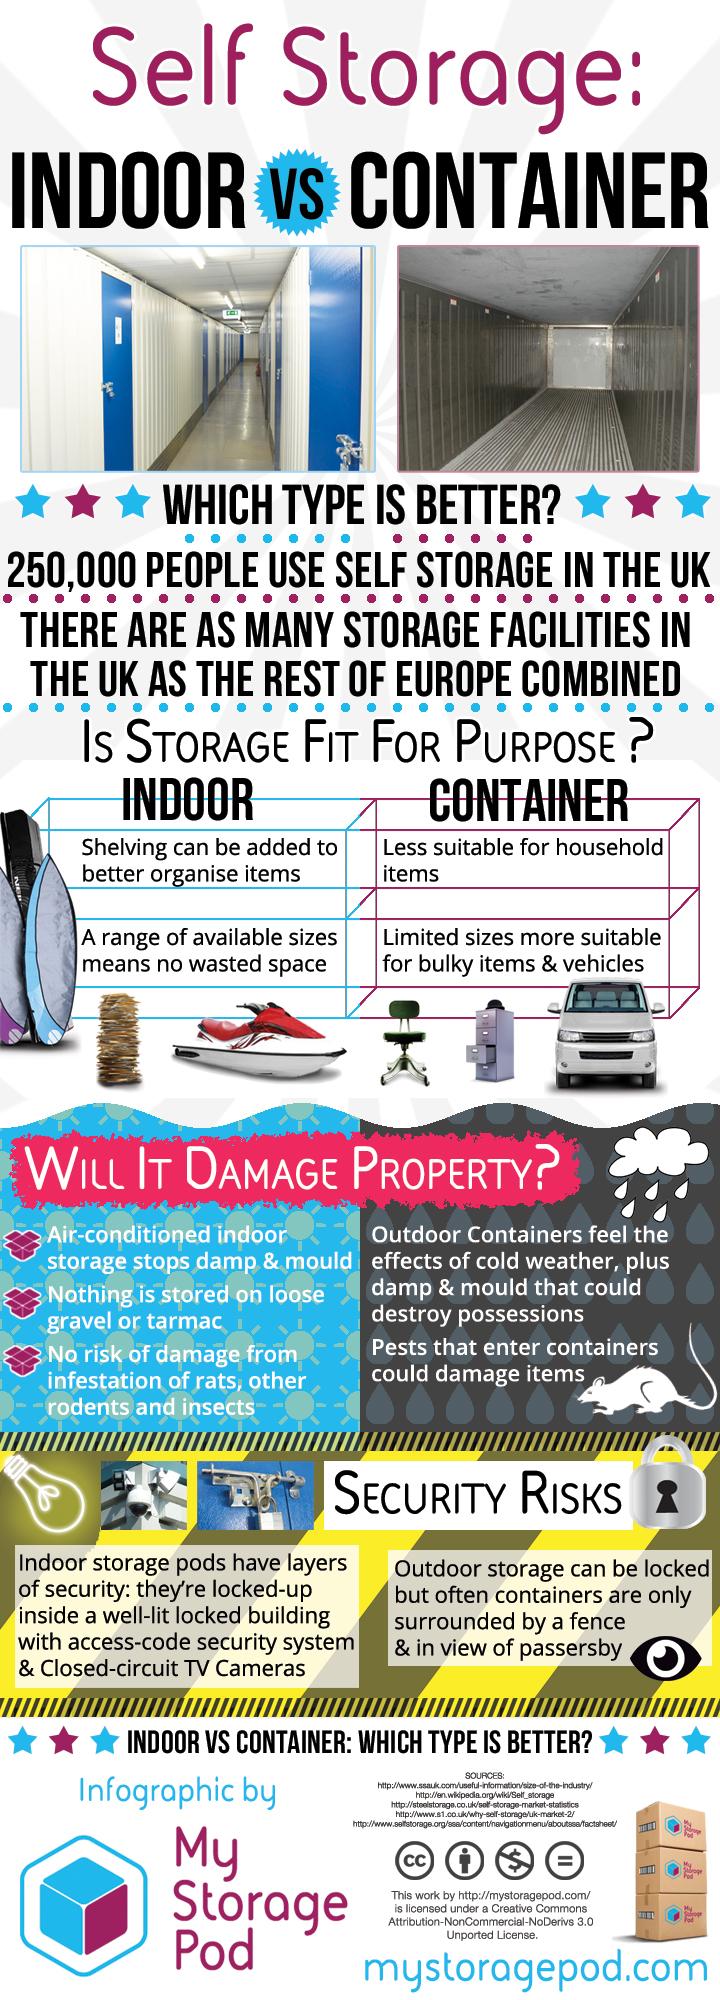 Self-storage Indoor vs Container Infographic